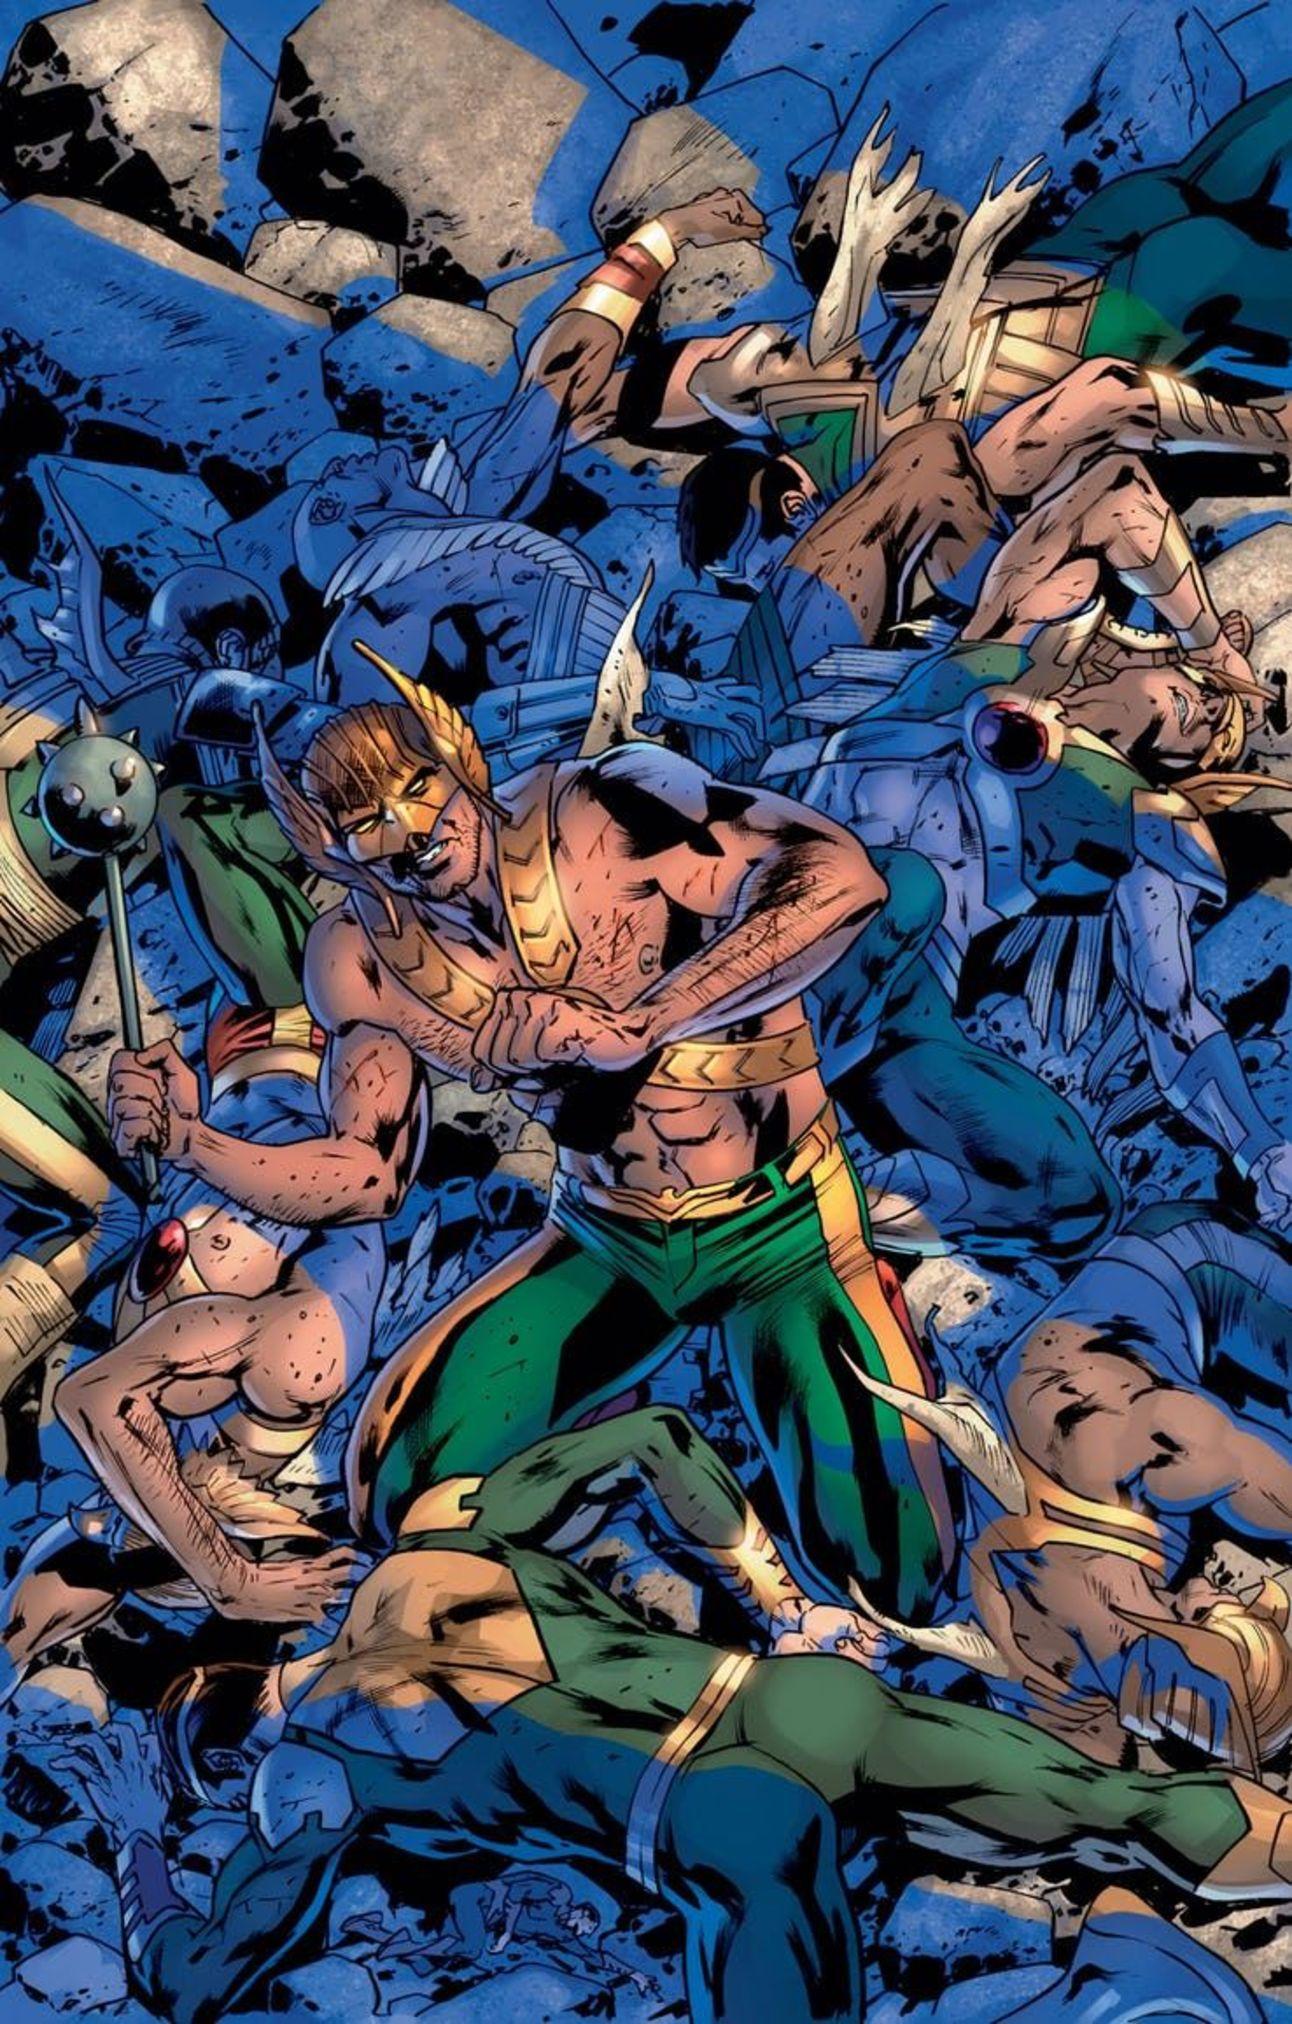 fd9b15a63 DC Comics single-issue solicitations for April 2019